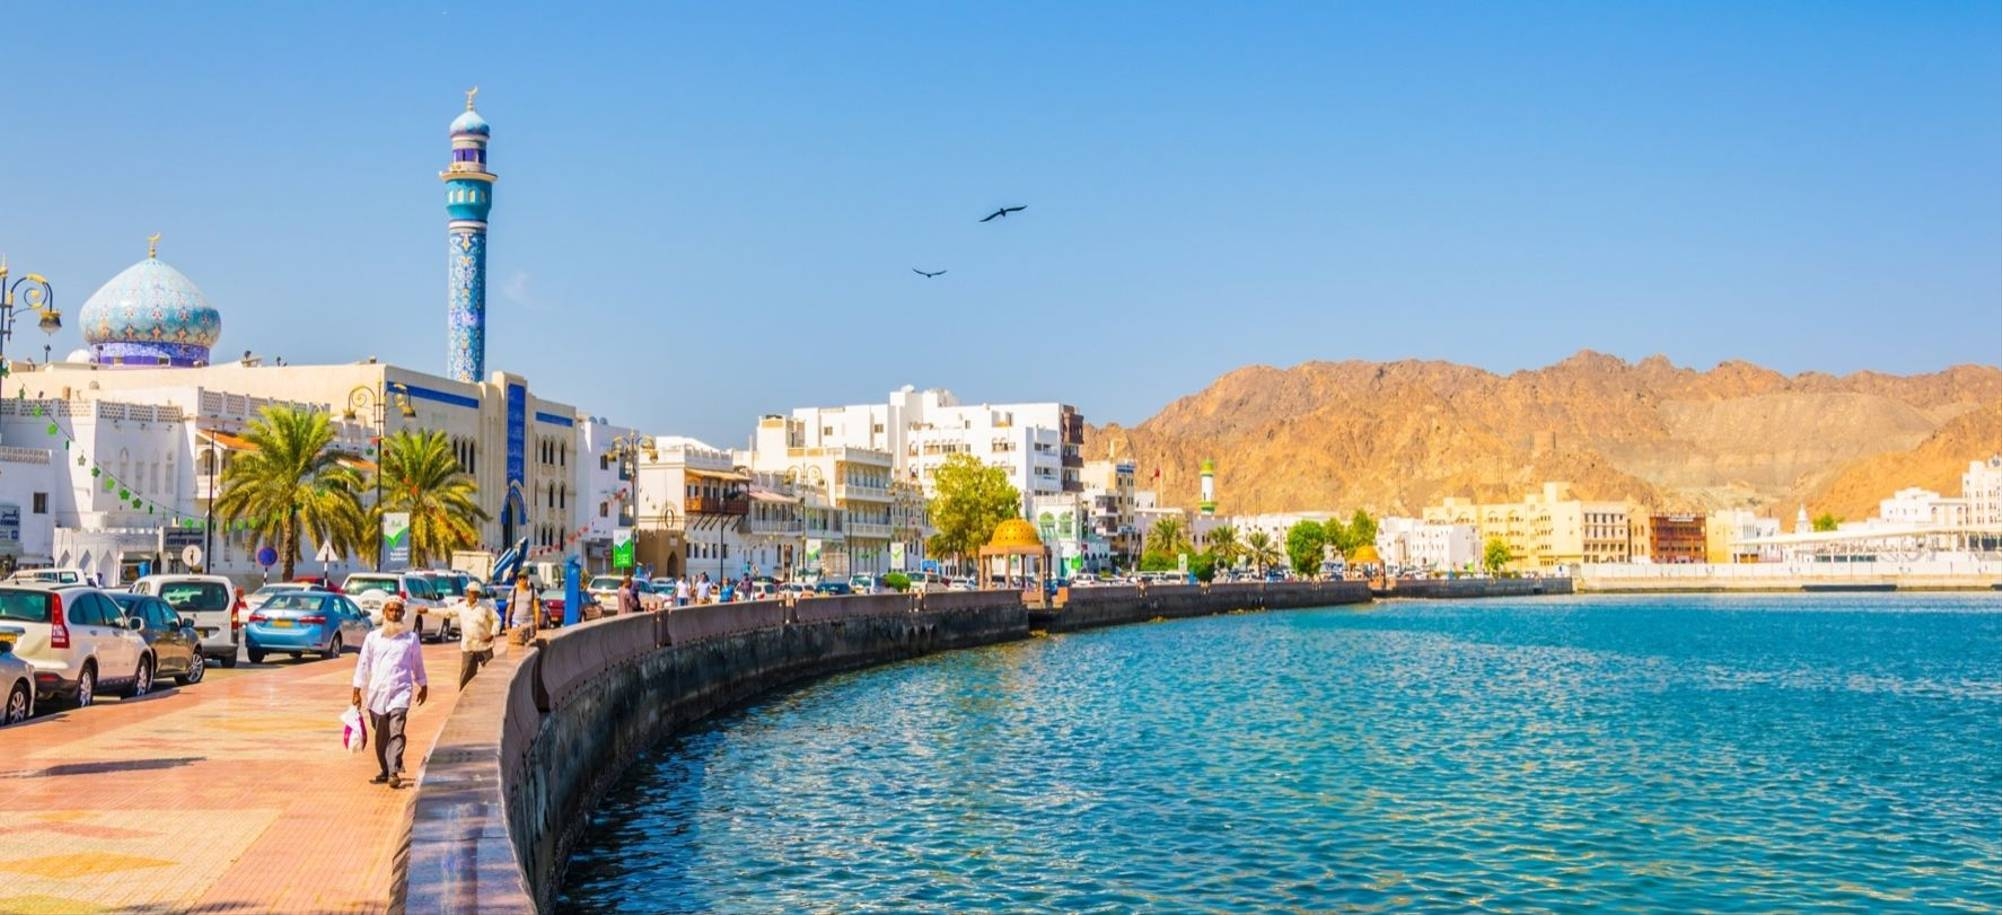 Muscat -coastline of Muttrah- Itinerary Desktop.jpg